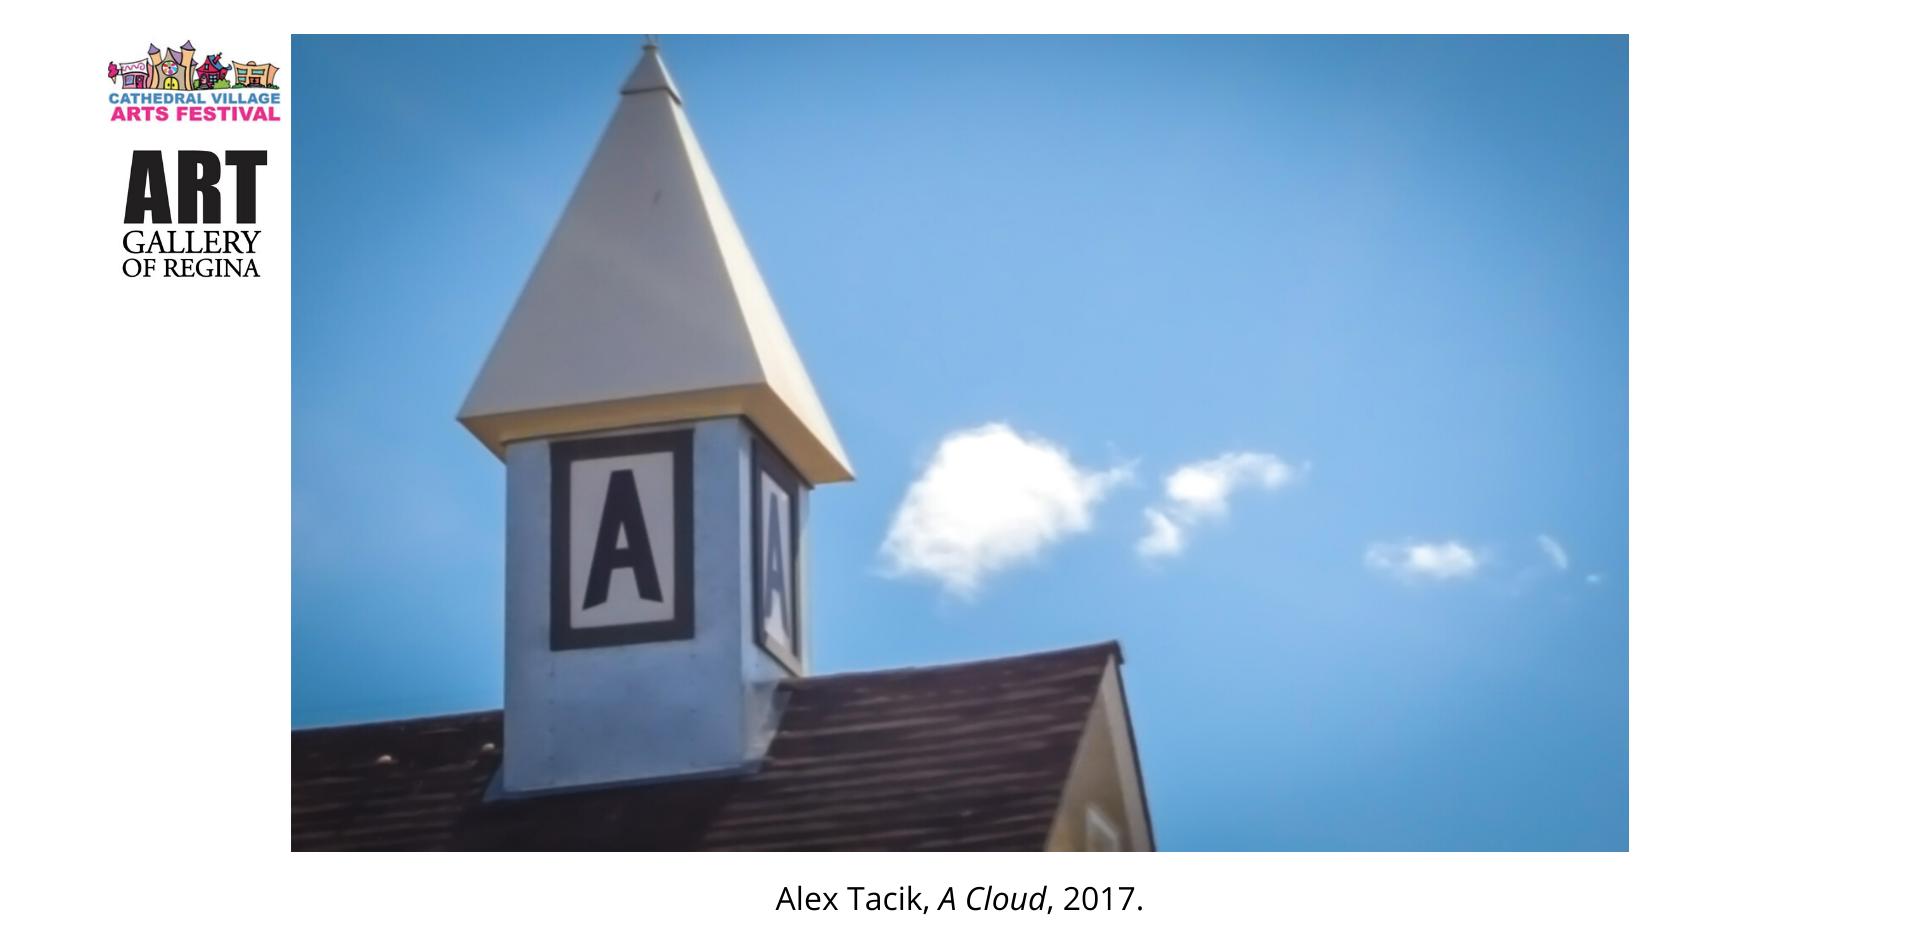 Alex Tacik, A Cloud, 2017.